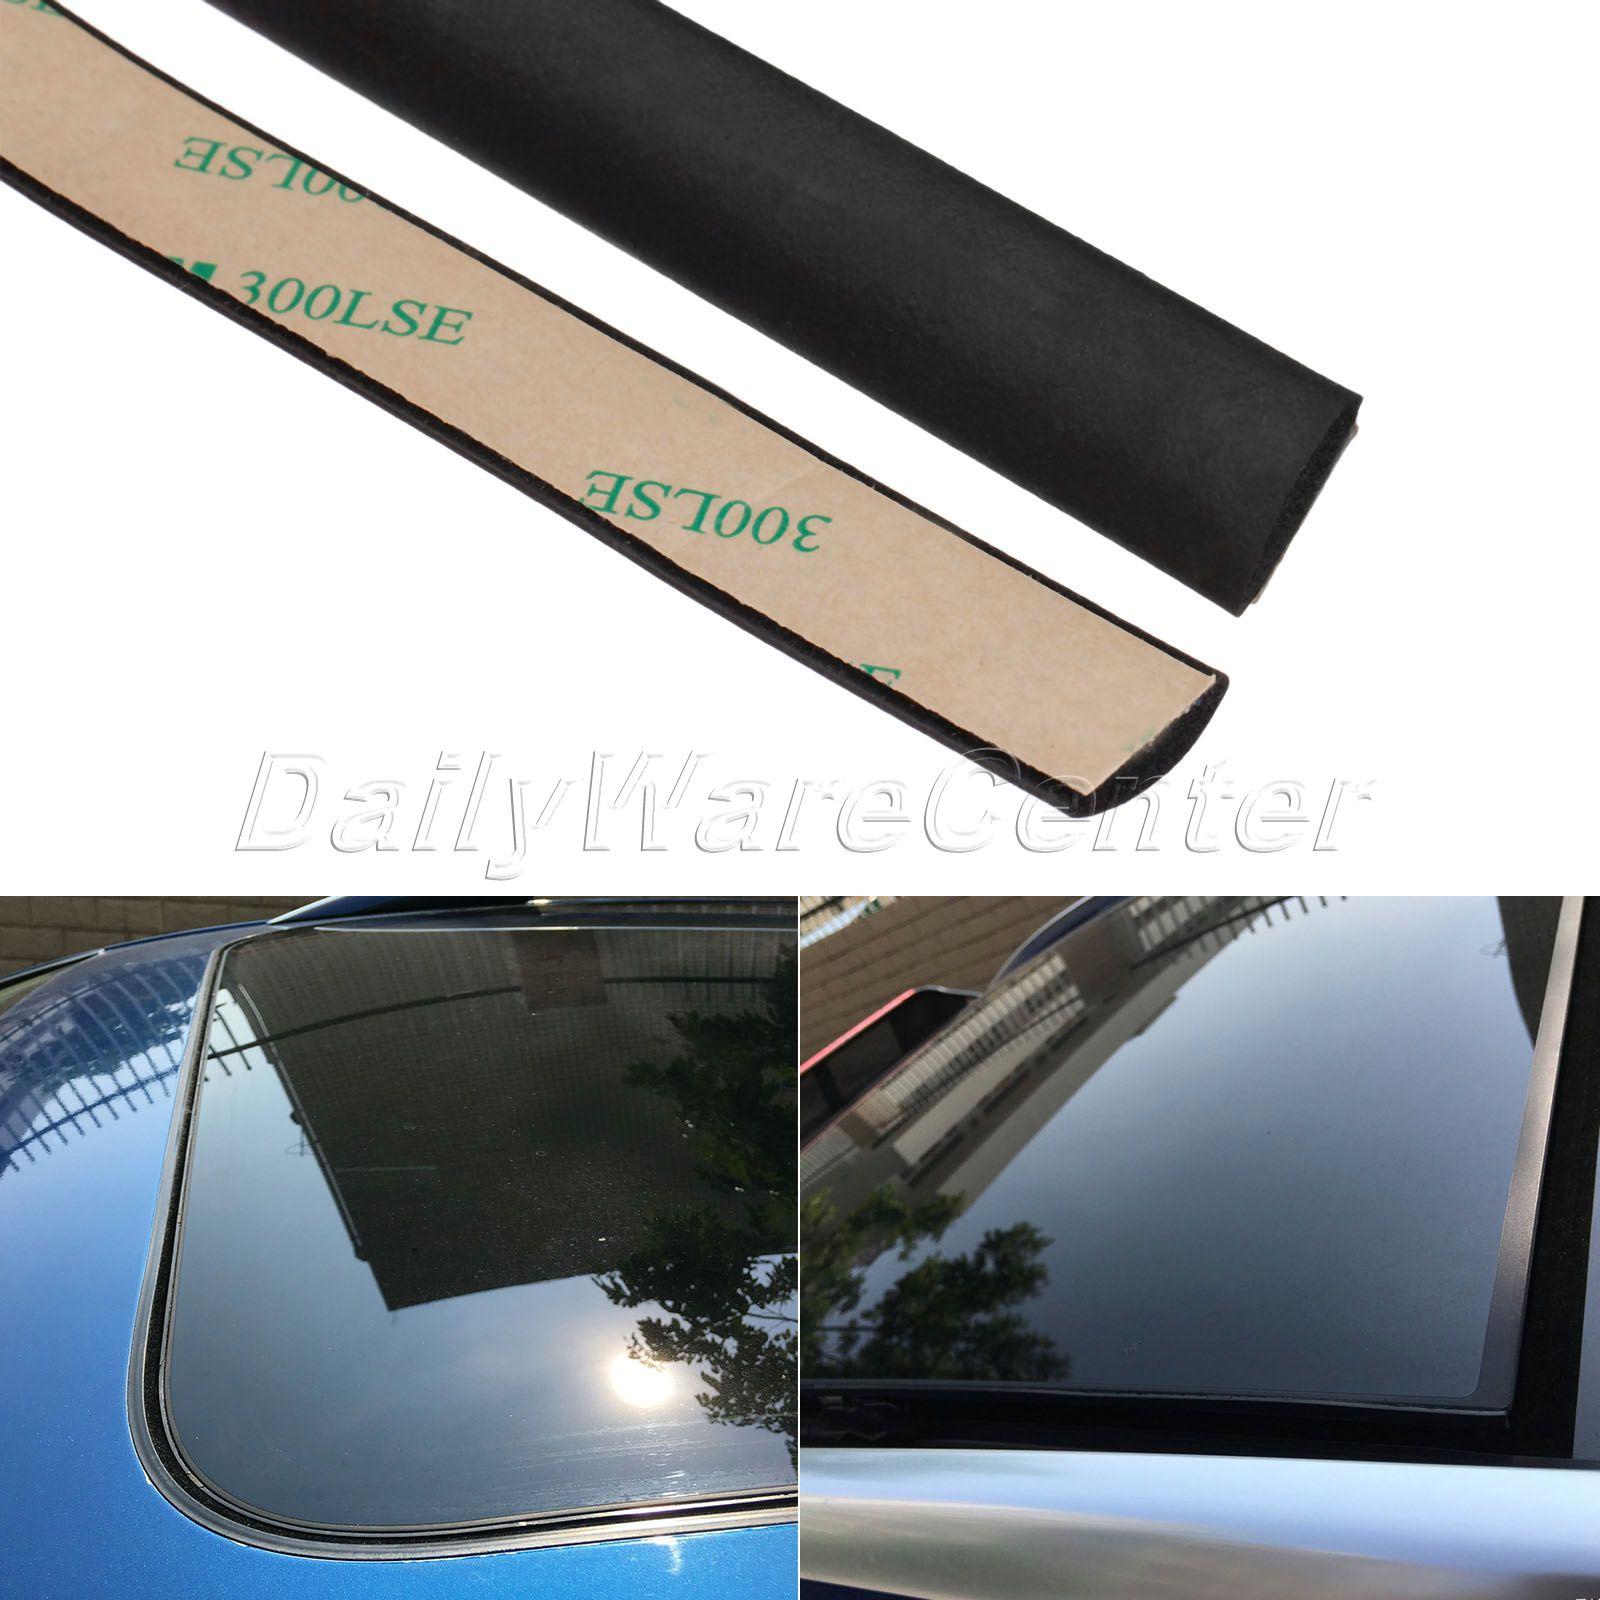 5 Meter Waterproof Rubber Sealing Strips Trim For Auto Car Front Rear Windshield Sunroof Triangular Window Edge Weatherstrip